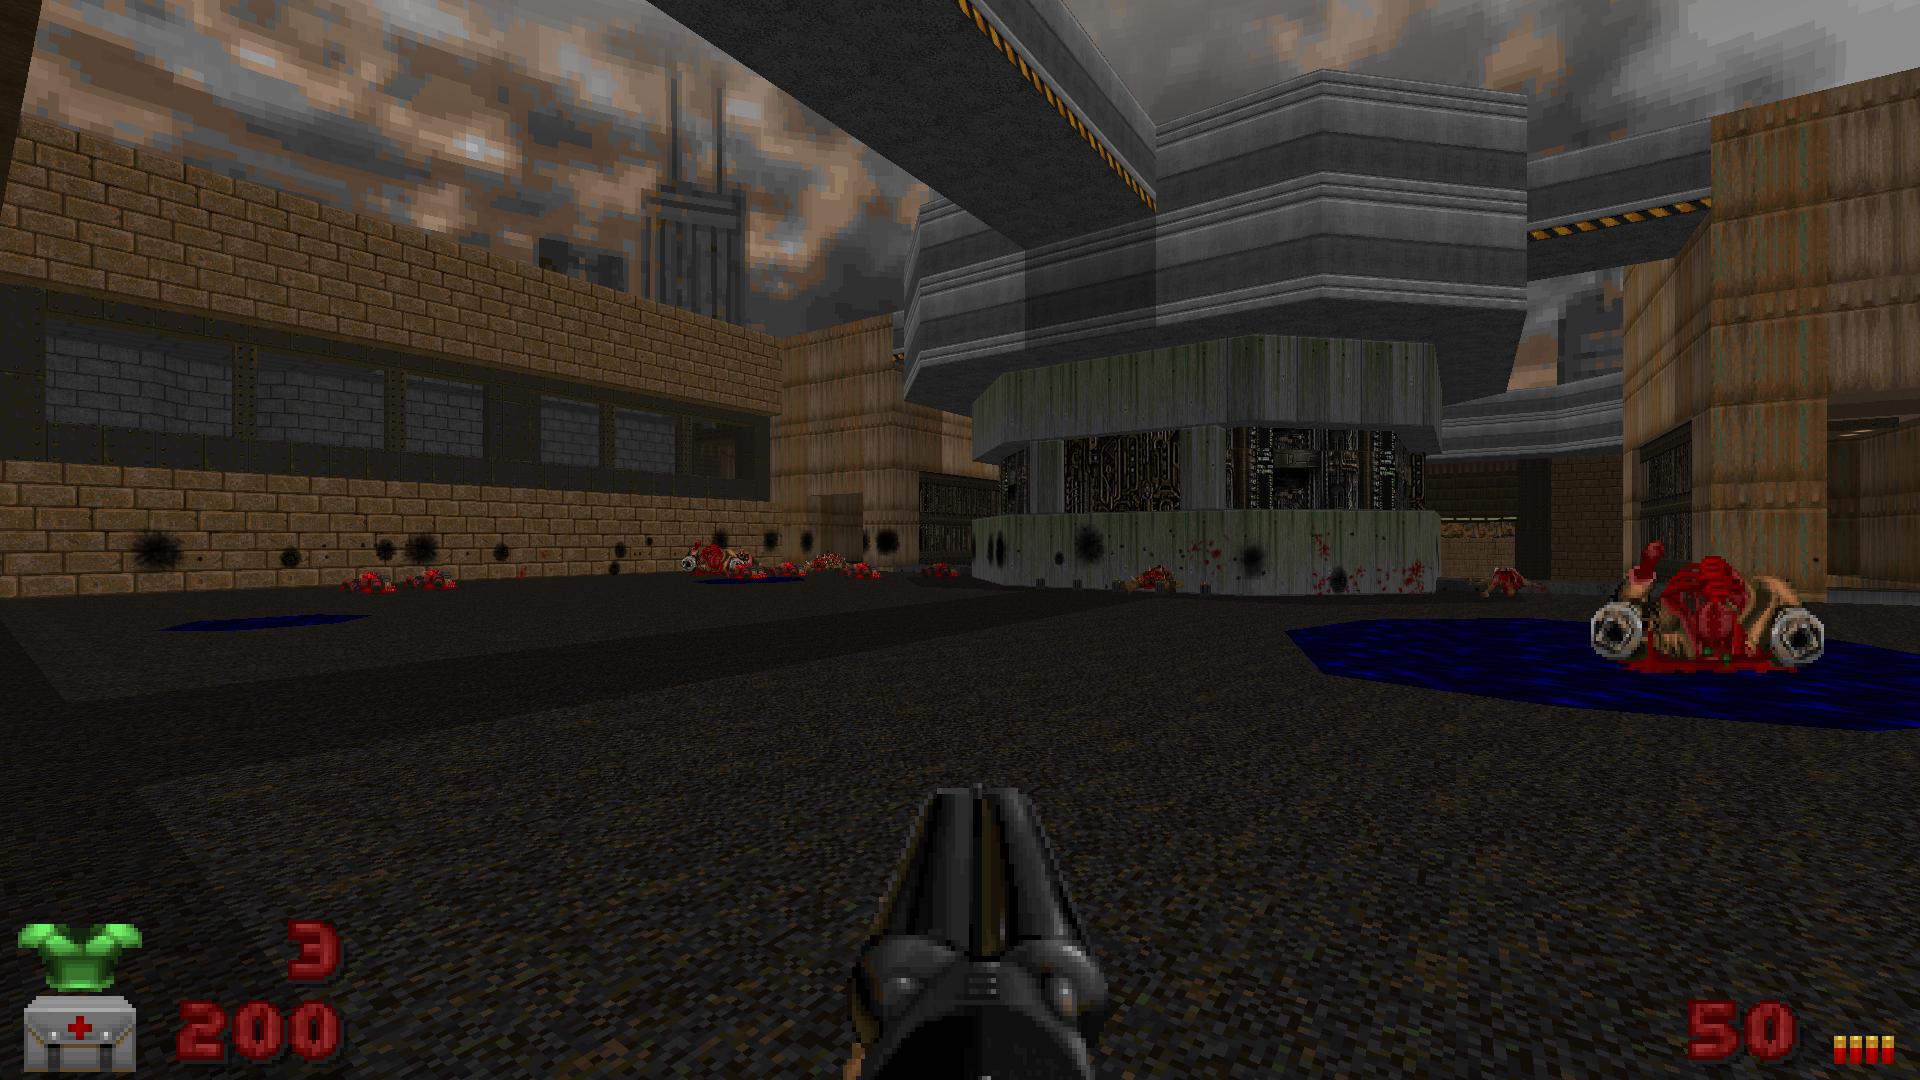 Screenshot_Doom_20200801_225011.png.634dd98ee53e6bb06b0c569e09d25dd7.png